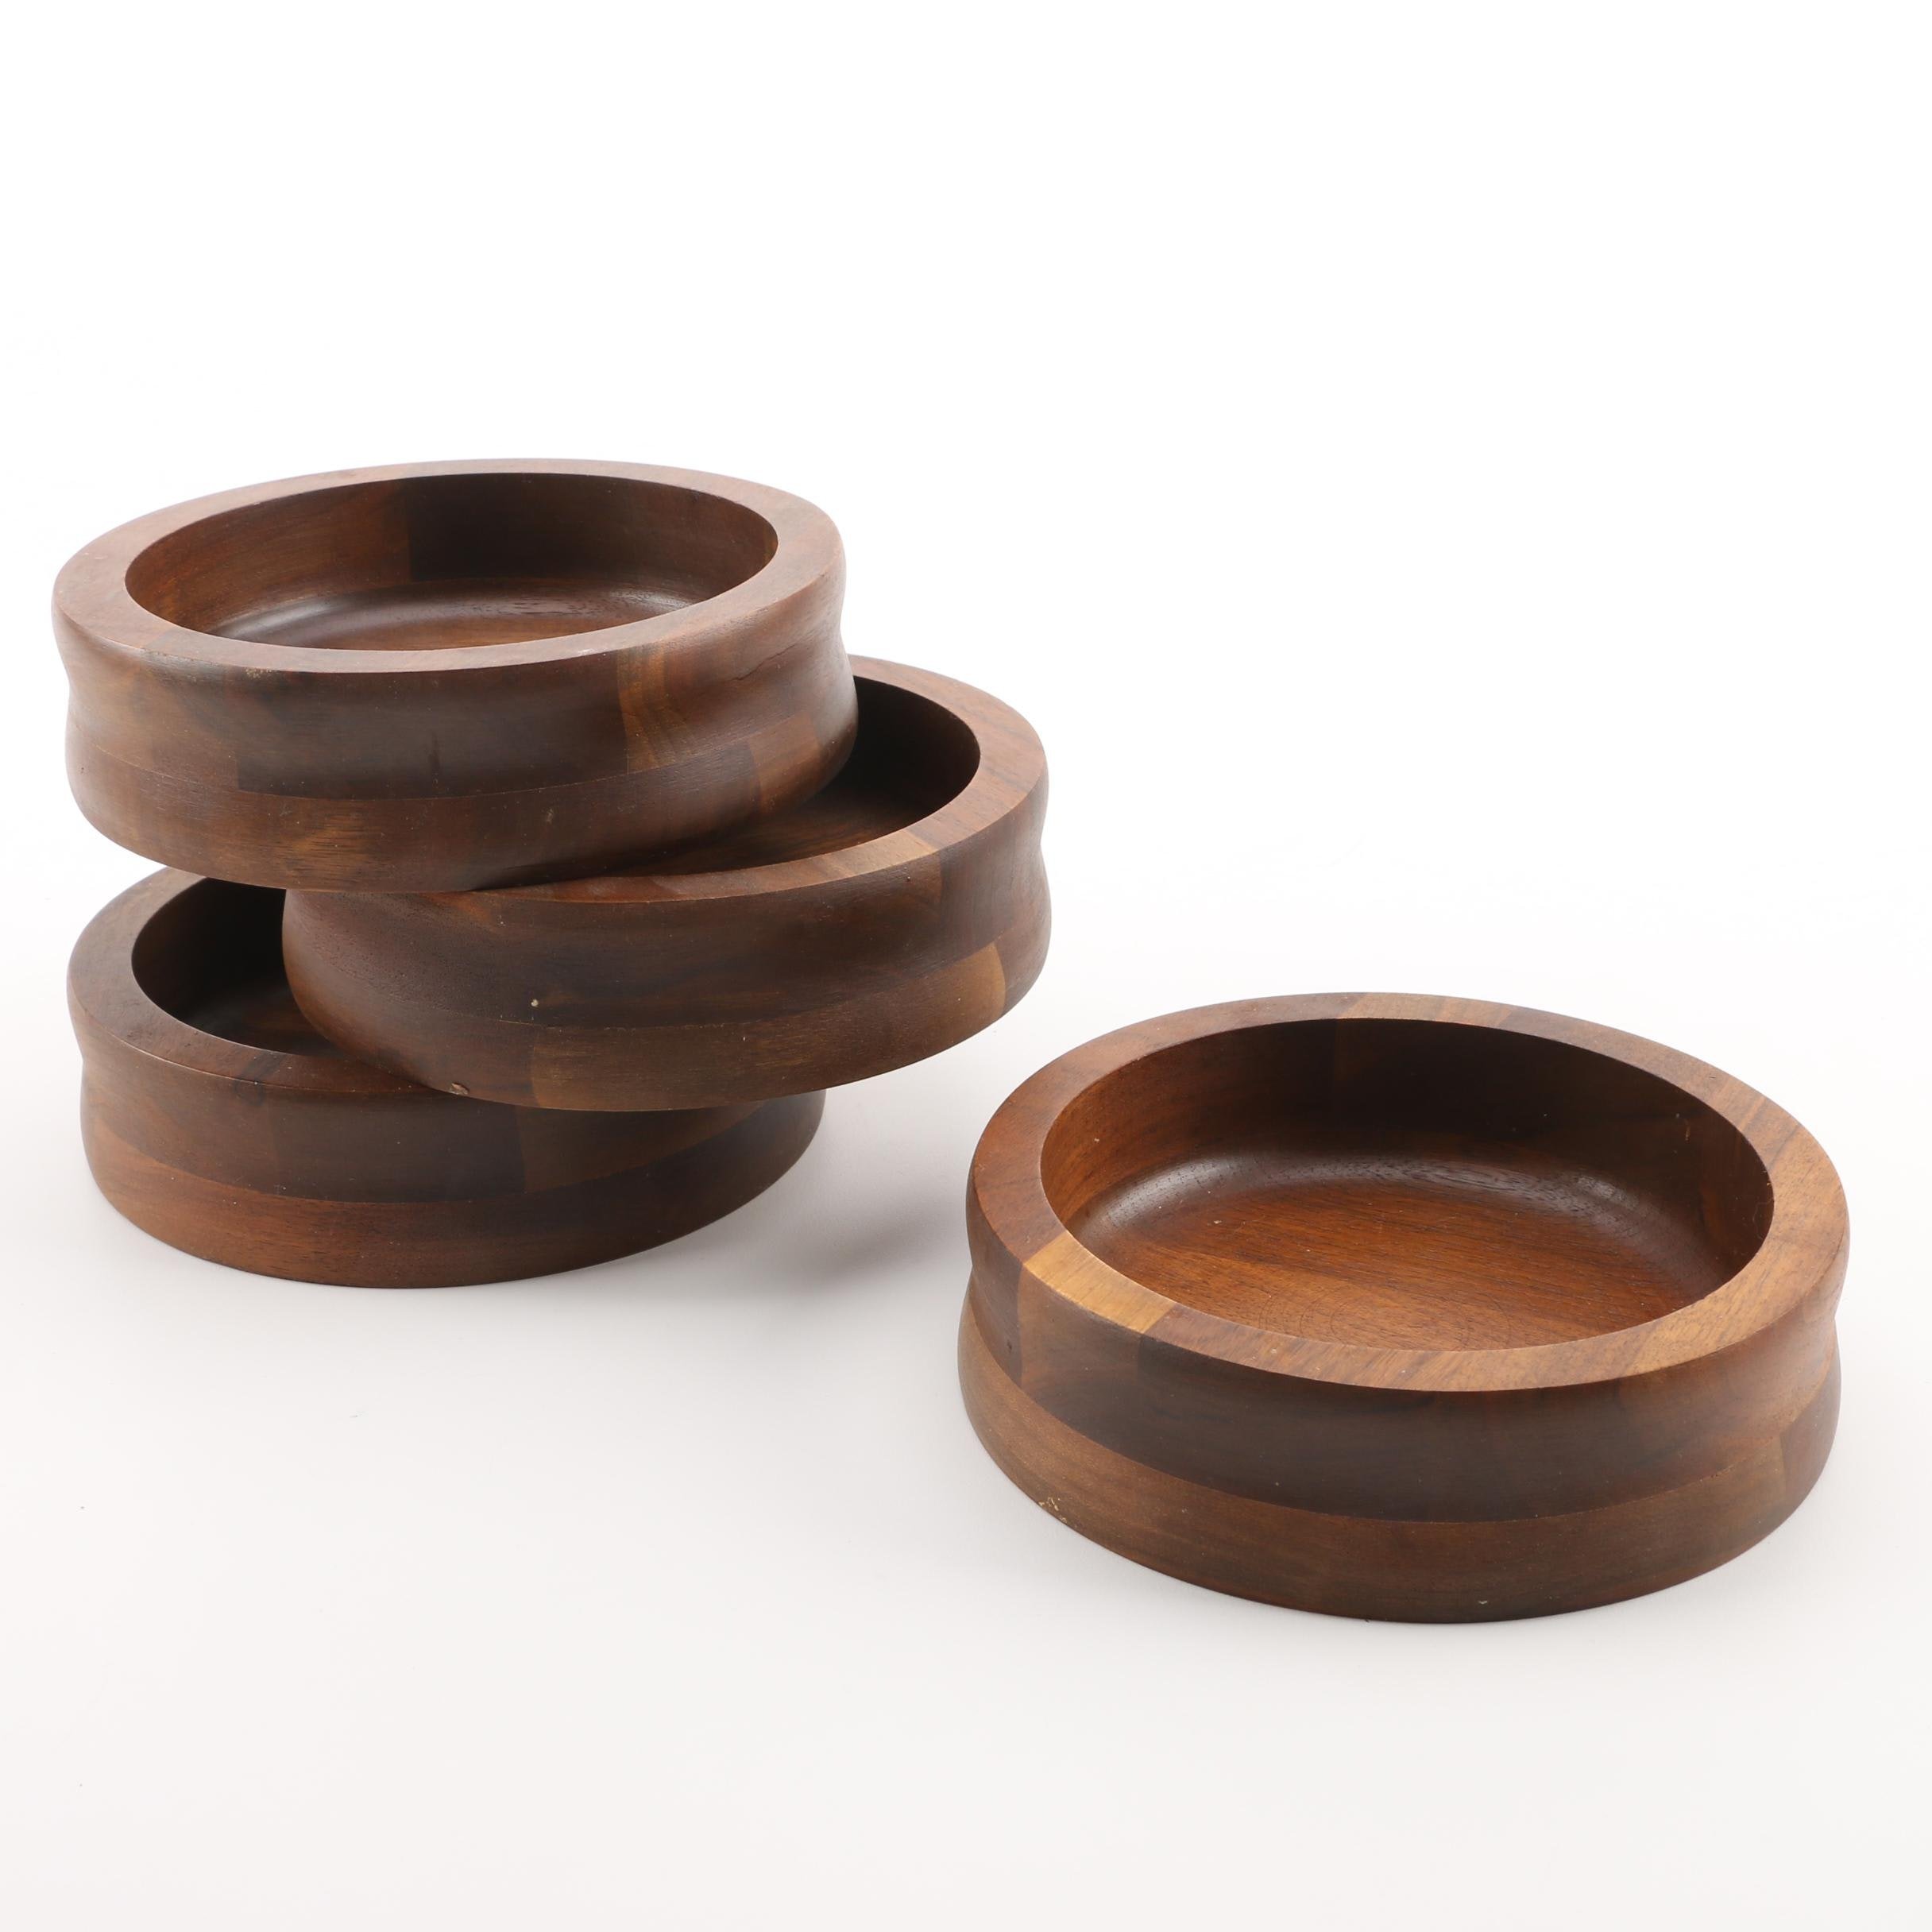 Four Wood Bowls